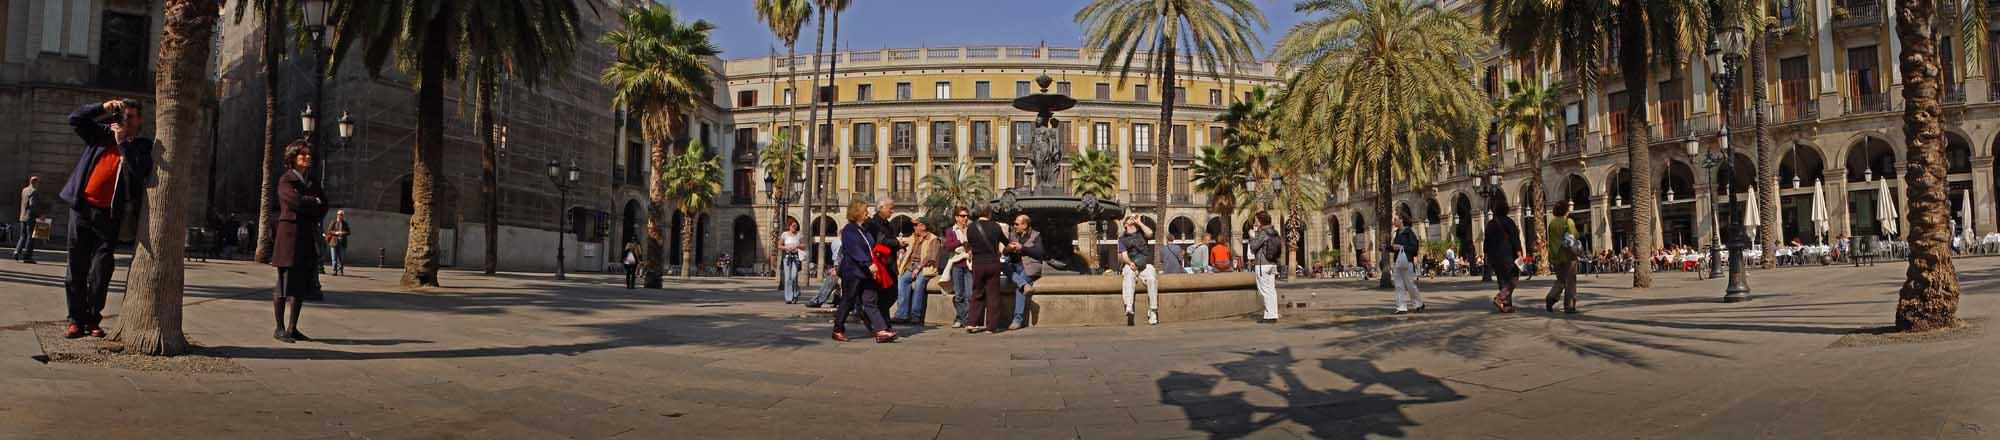 Plaza Real.